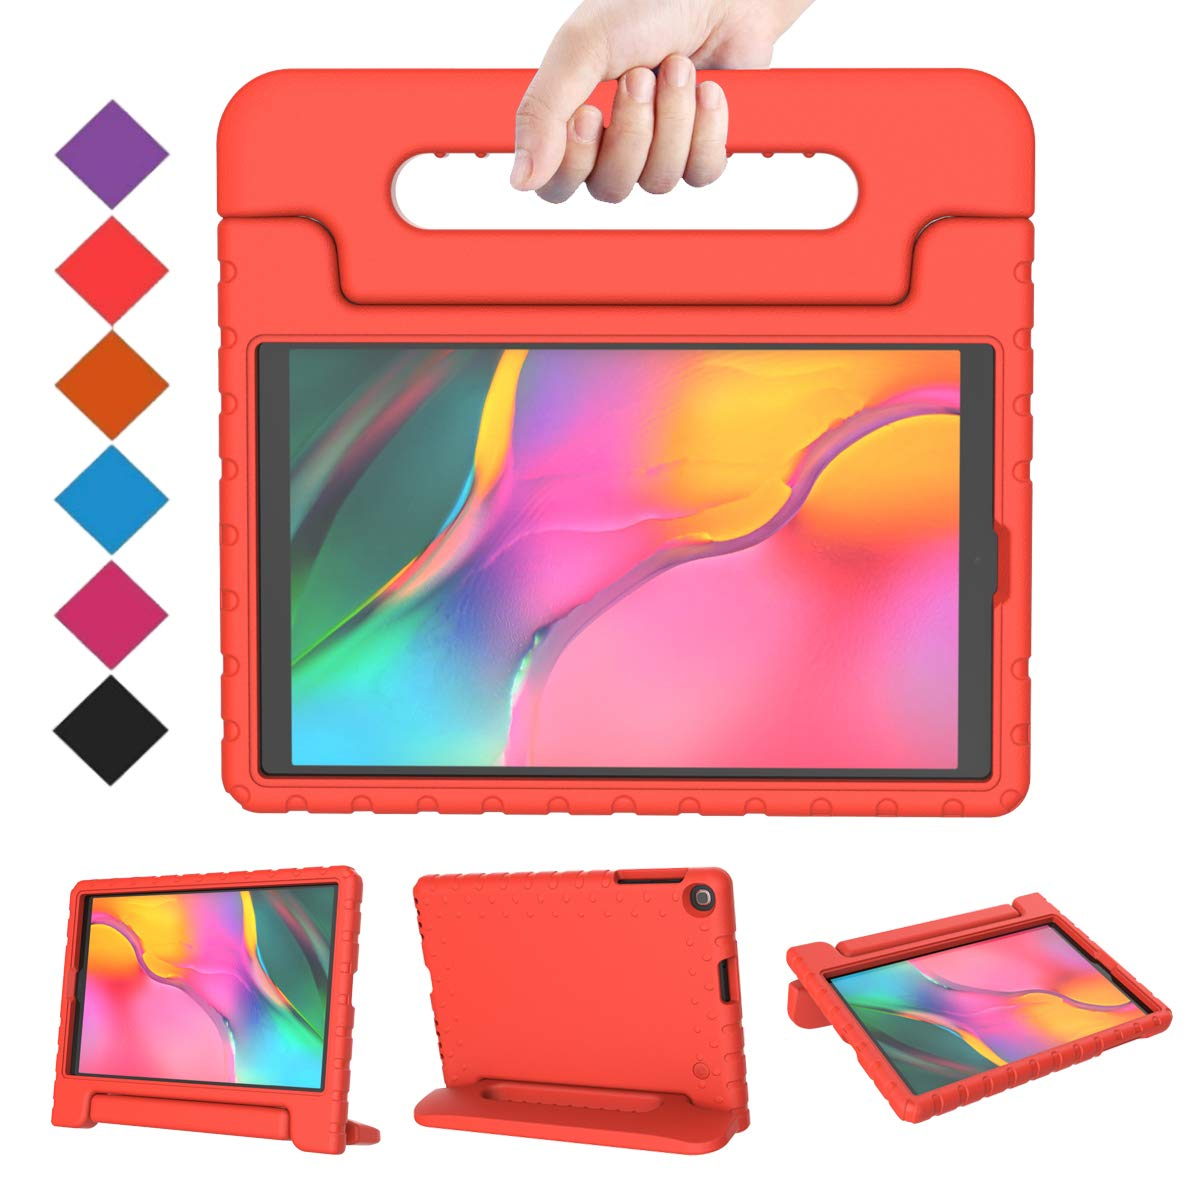 Funda Para Samsung Galaxy Tab A 10.1 Sm-t510 (2019) Roja